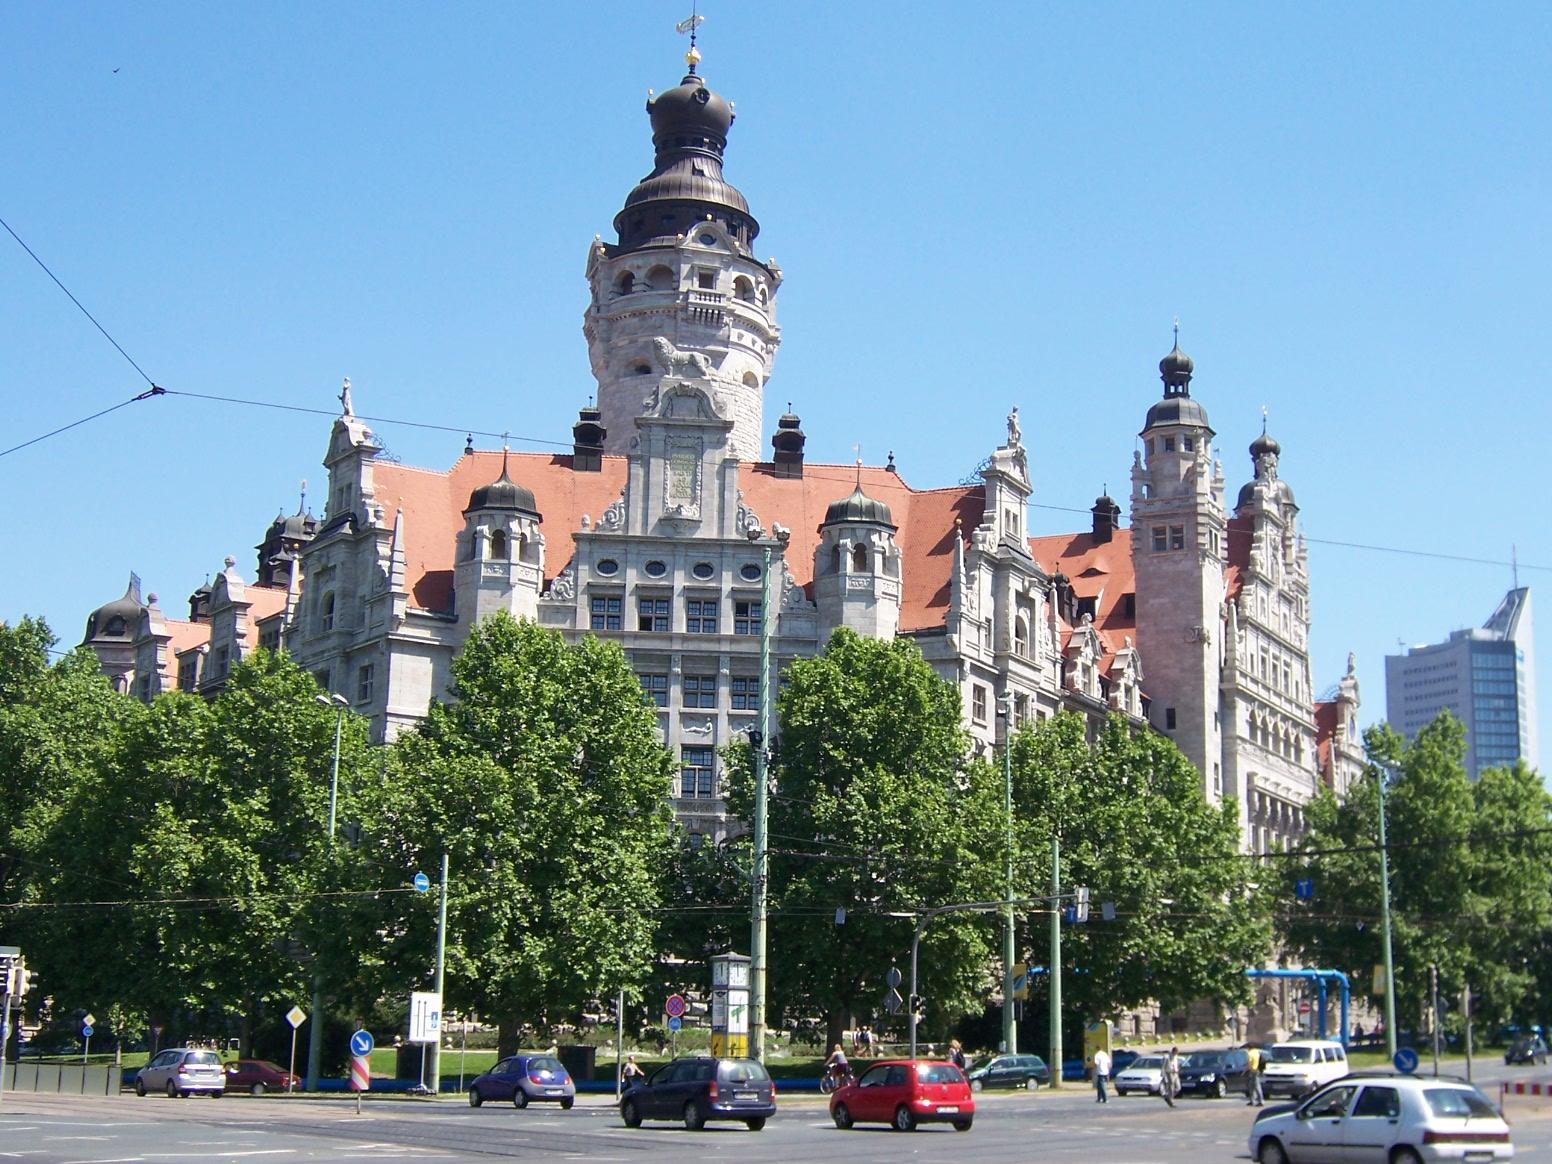 © Jungpionier/Leipzig/Wiki Commons